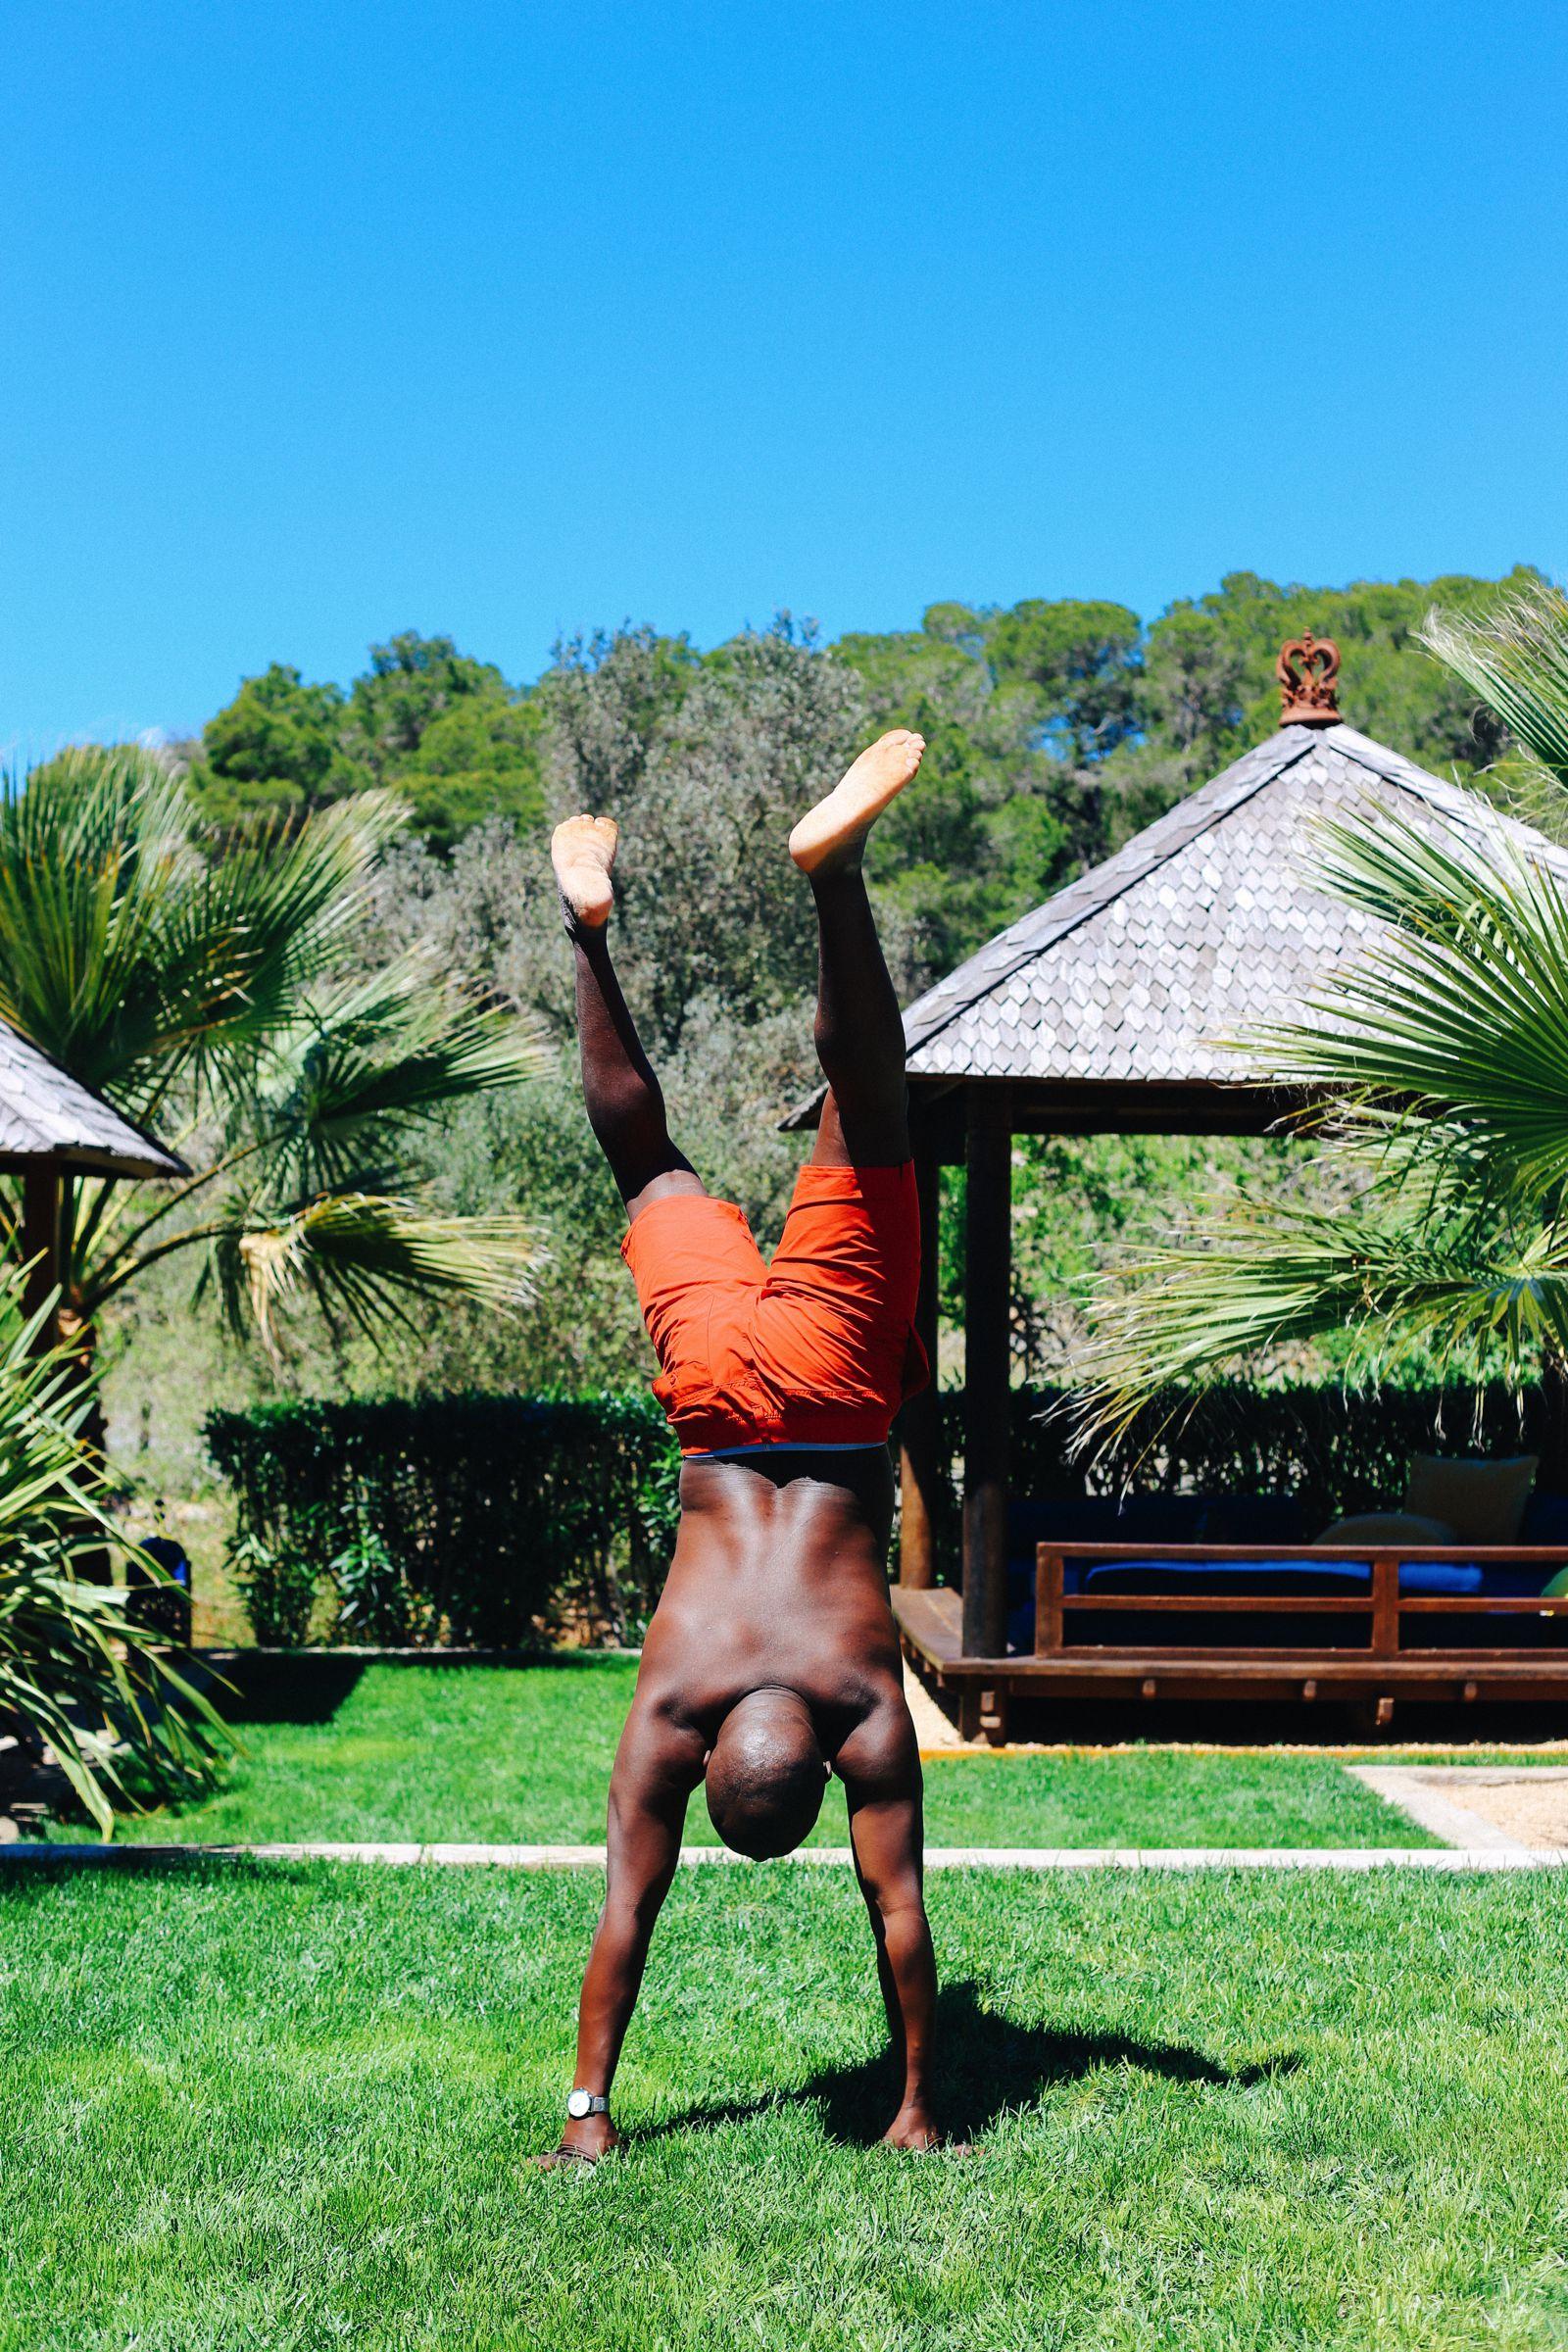 Ibiza Summer Fun In The Sun with Kapten & Sons (9)